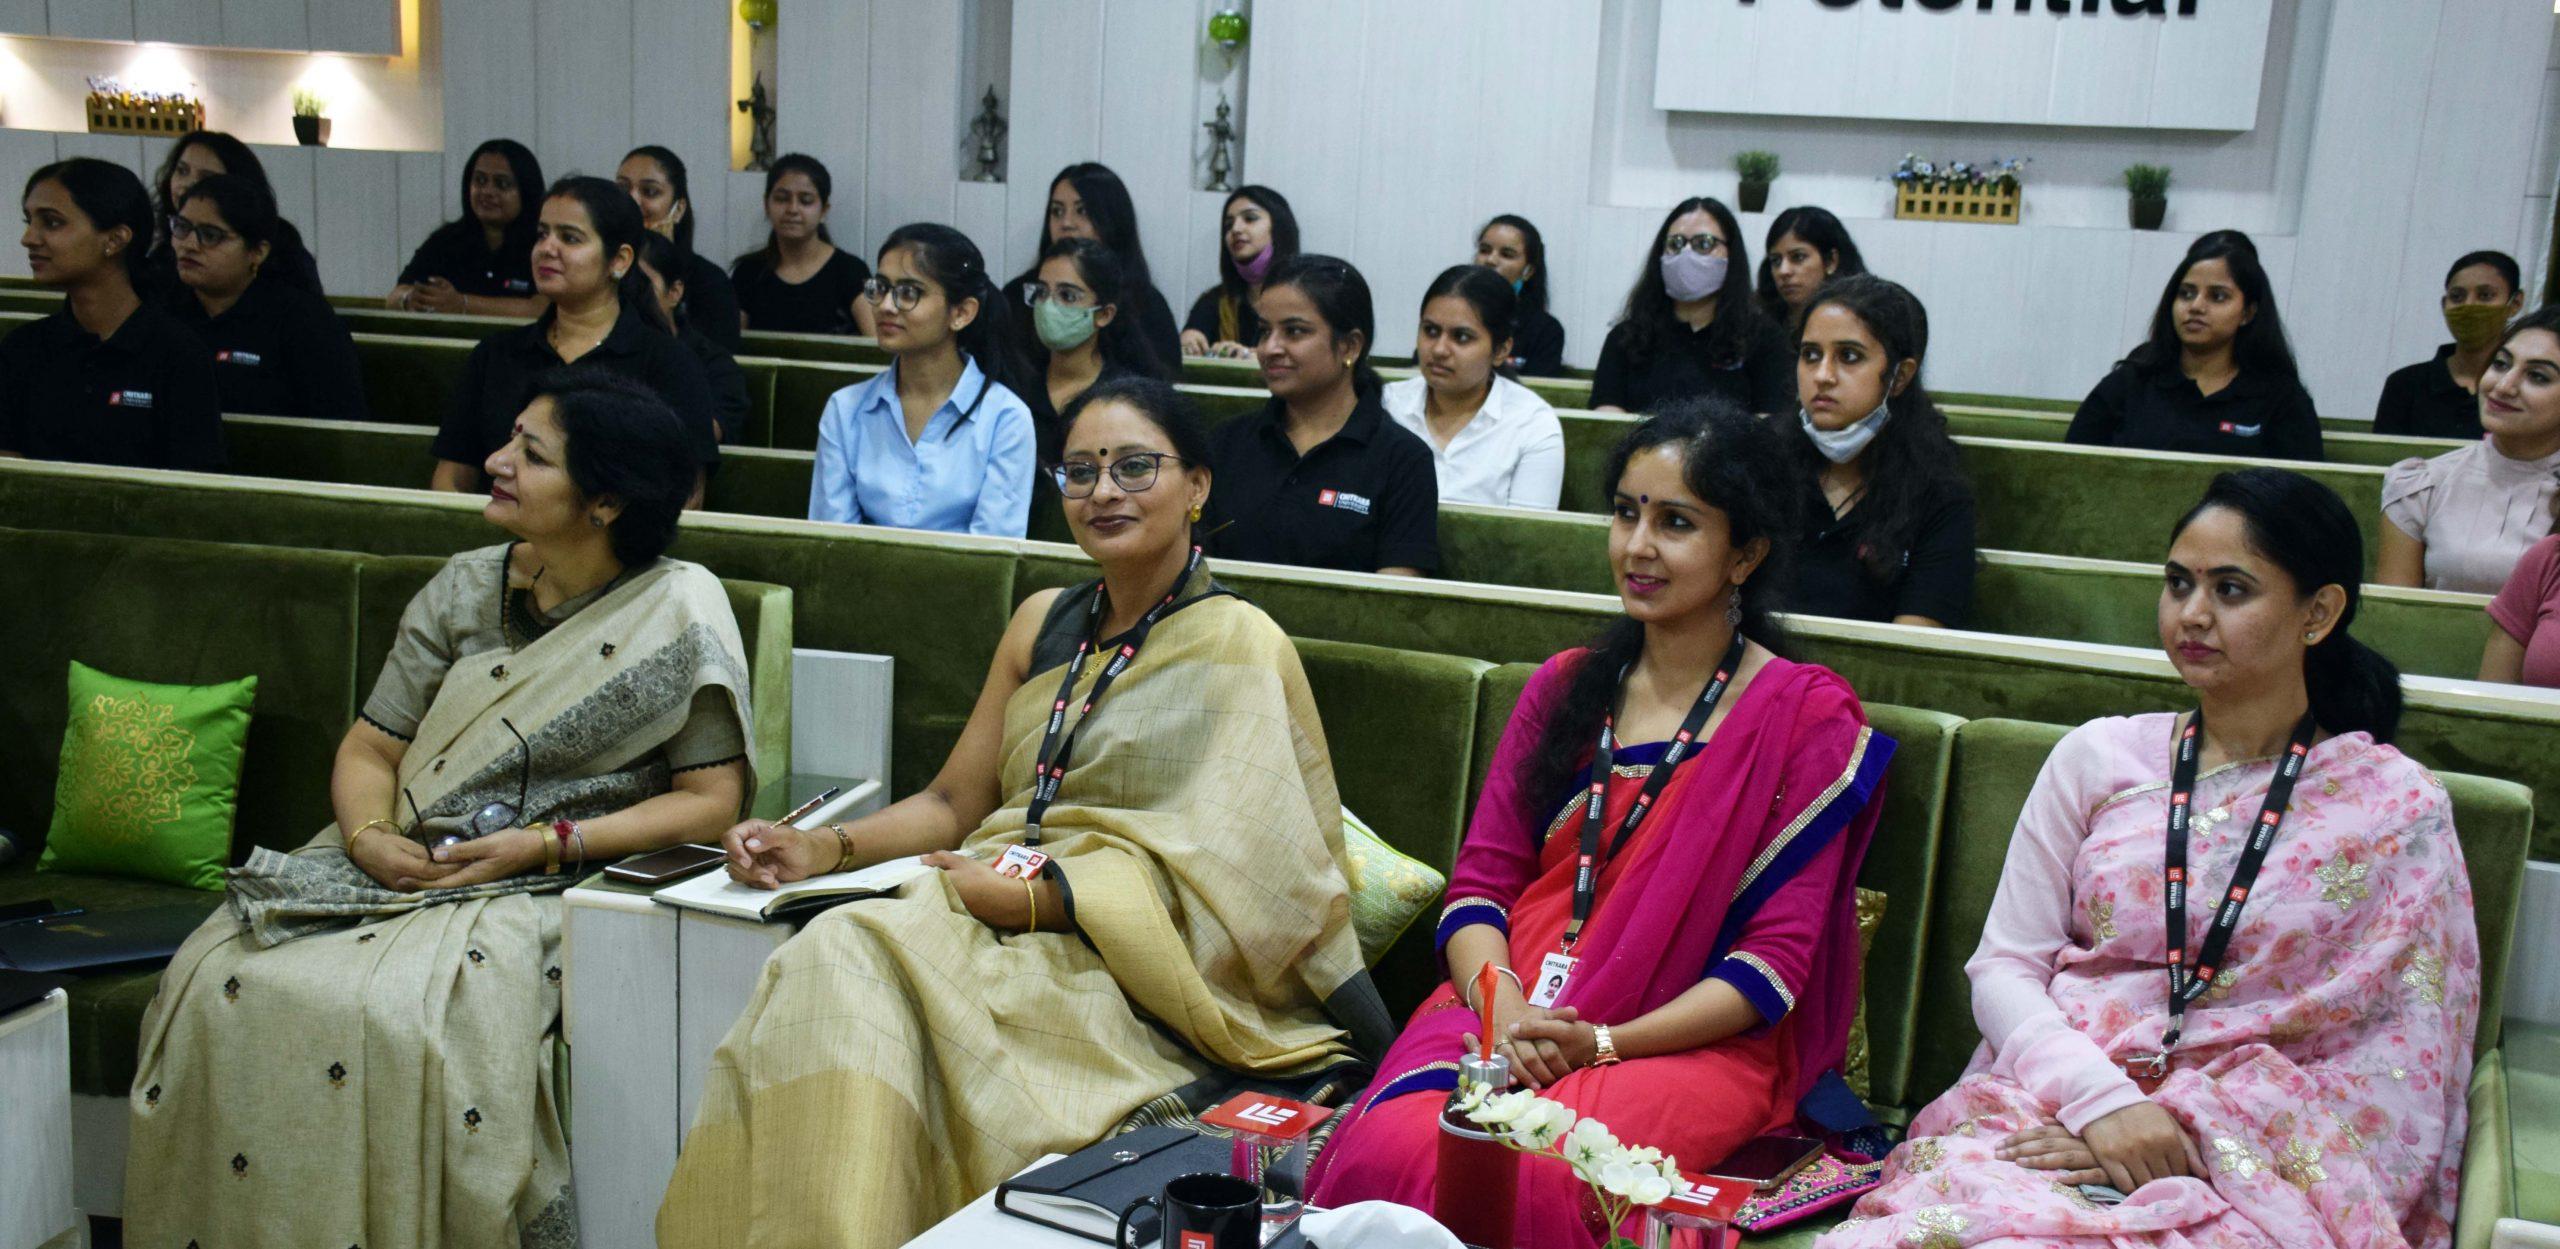 Chitkara University's Education program starts with Padam Bhushan Dr. Mallika Sarabhai's address